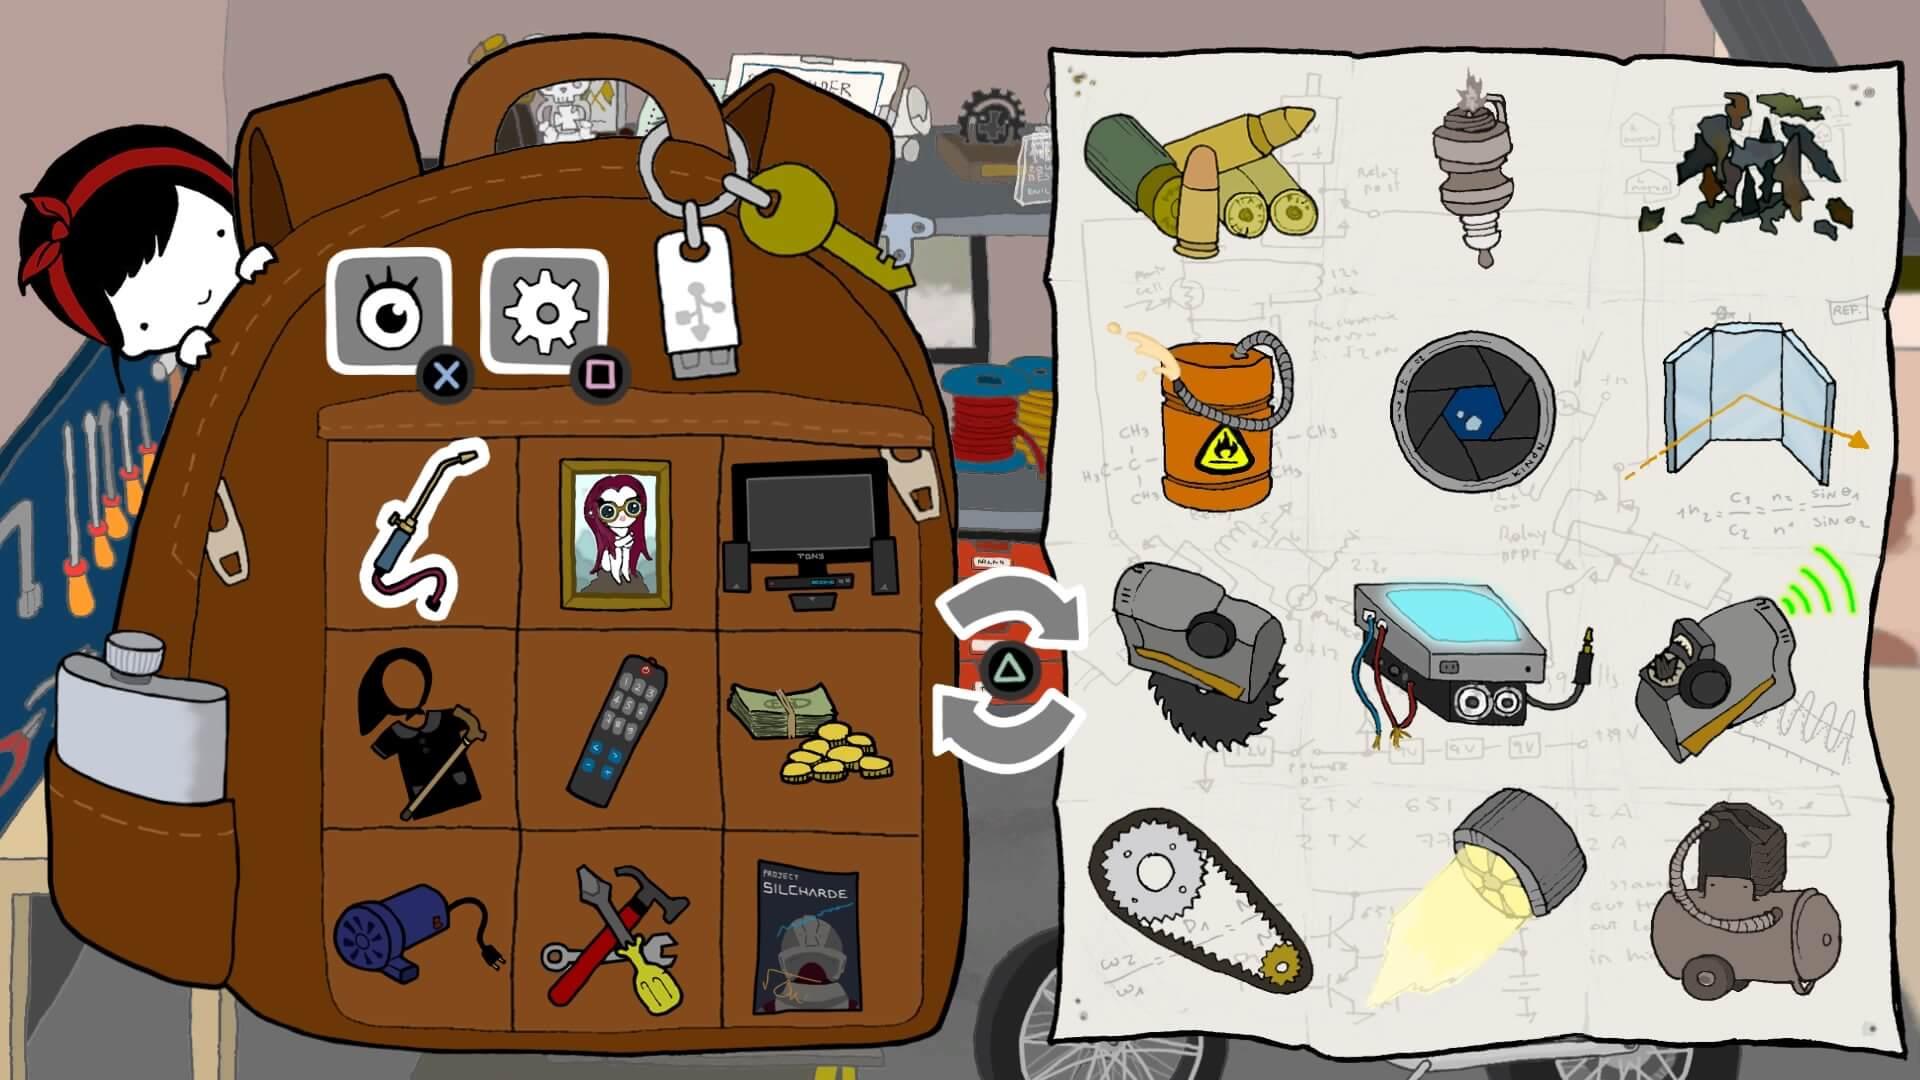 Nika's inventory screen